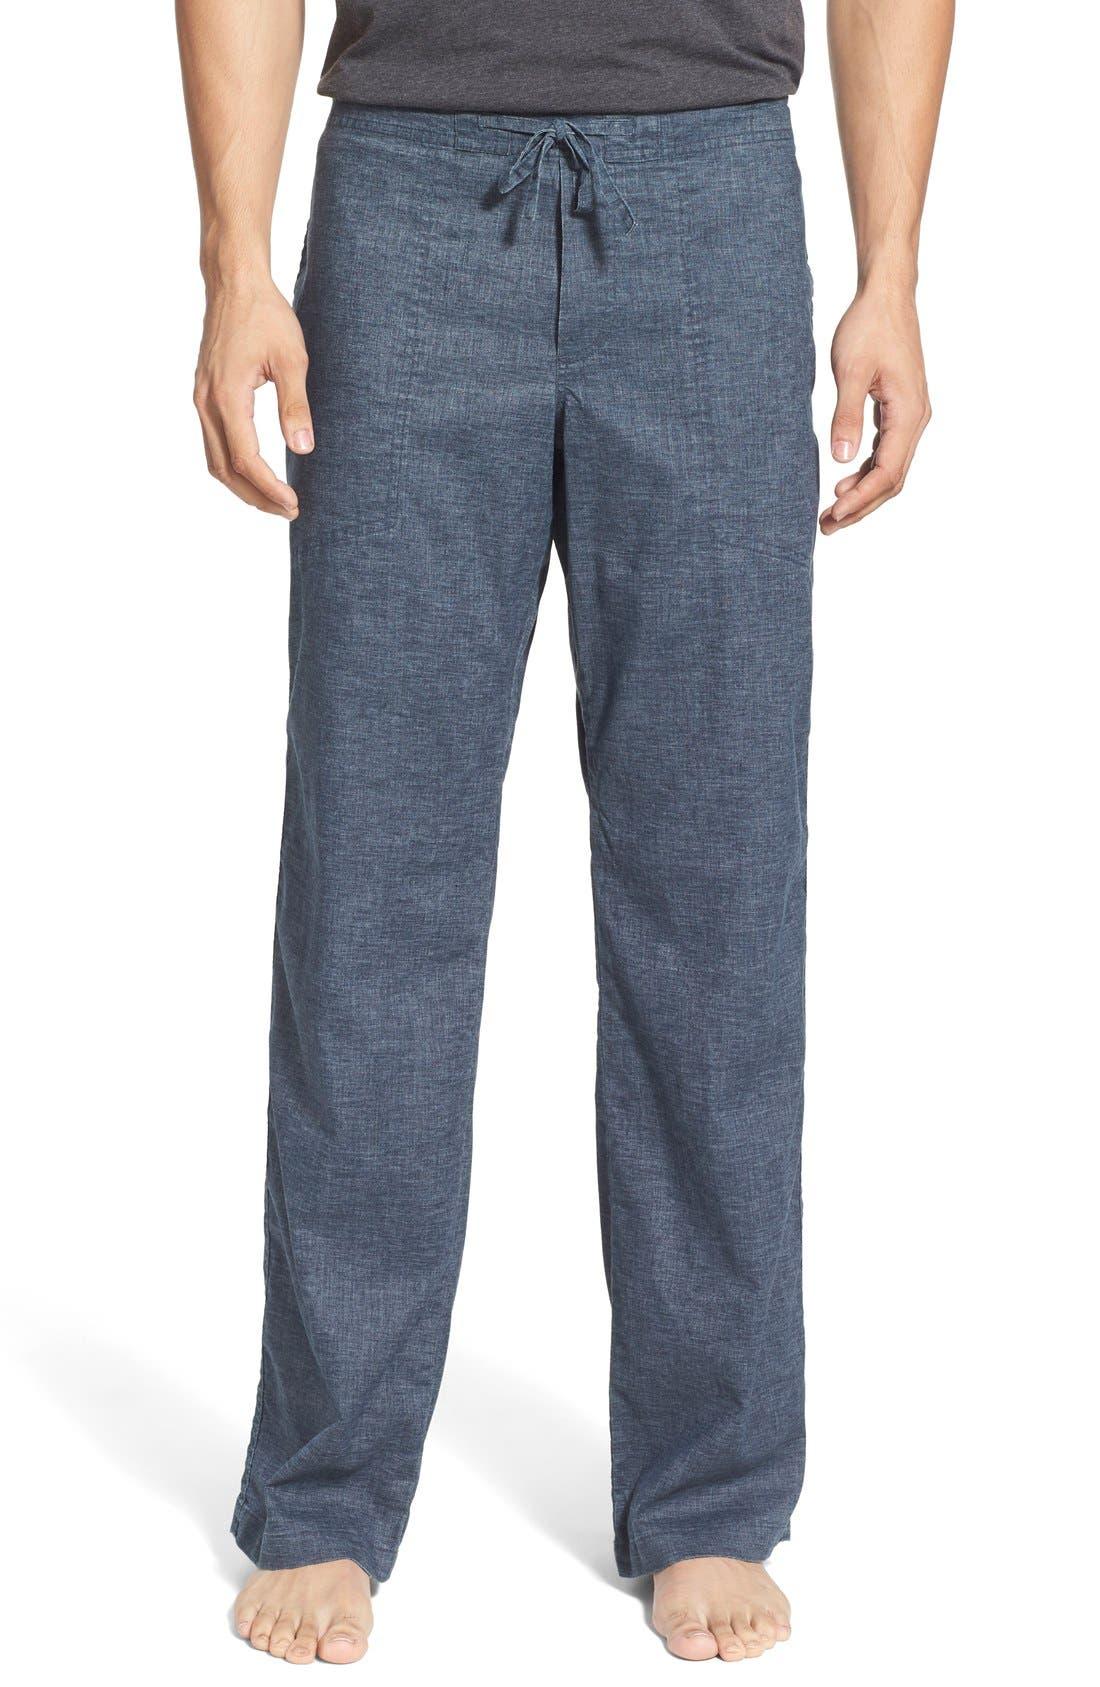 Alternate Image 1 Selected - prAna 'Sutra' Ralaxed Fit Drawstring Pants